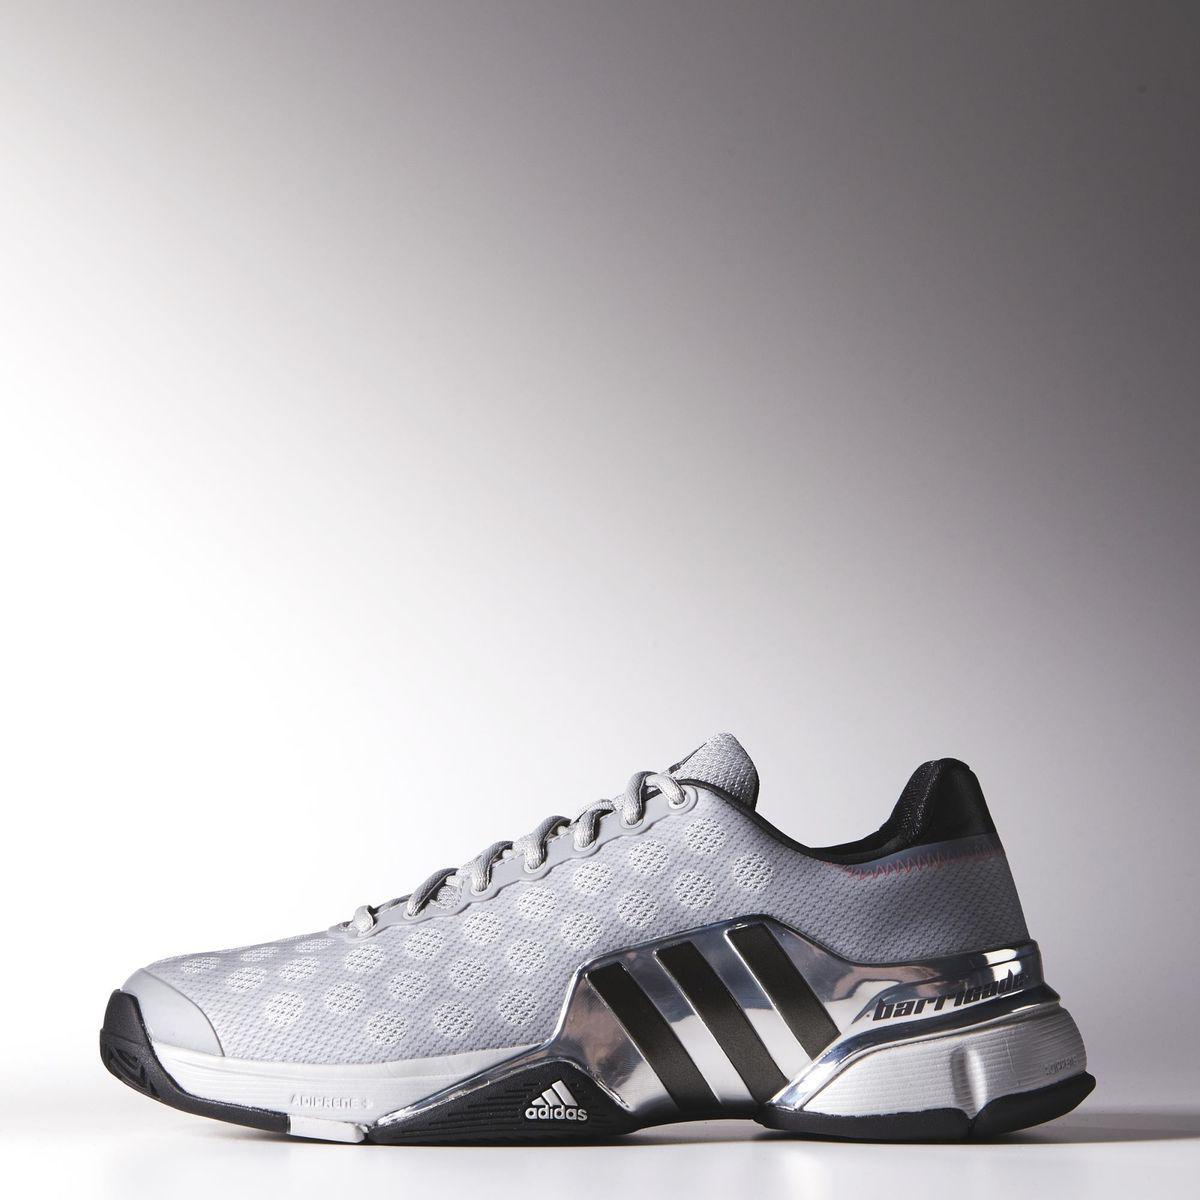 adidas mens barricata 2015 scarpe da tennis grey / ferro / silver